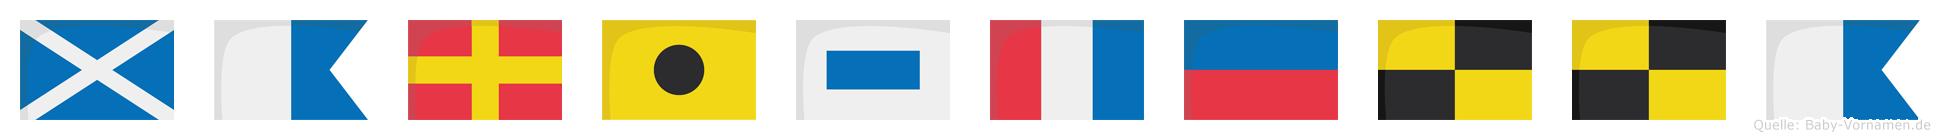 Maristella im Flaggenalphabet